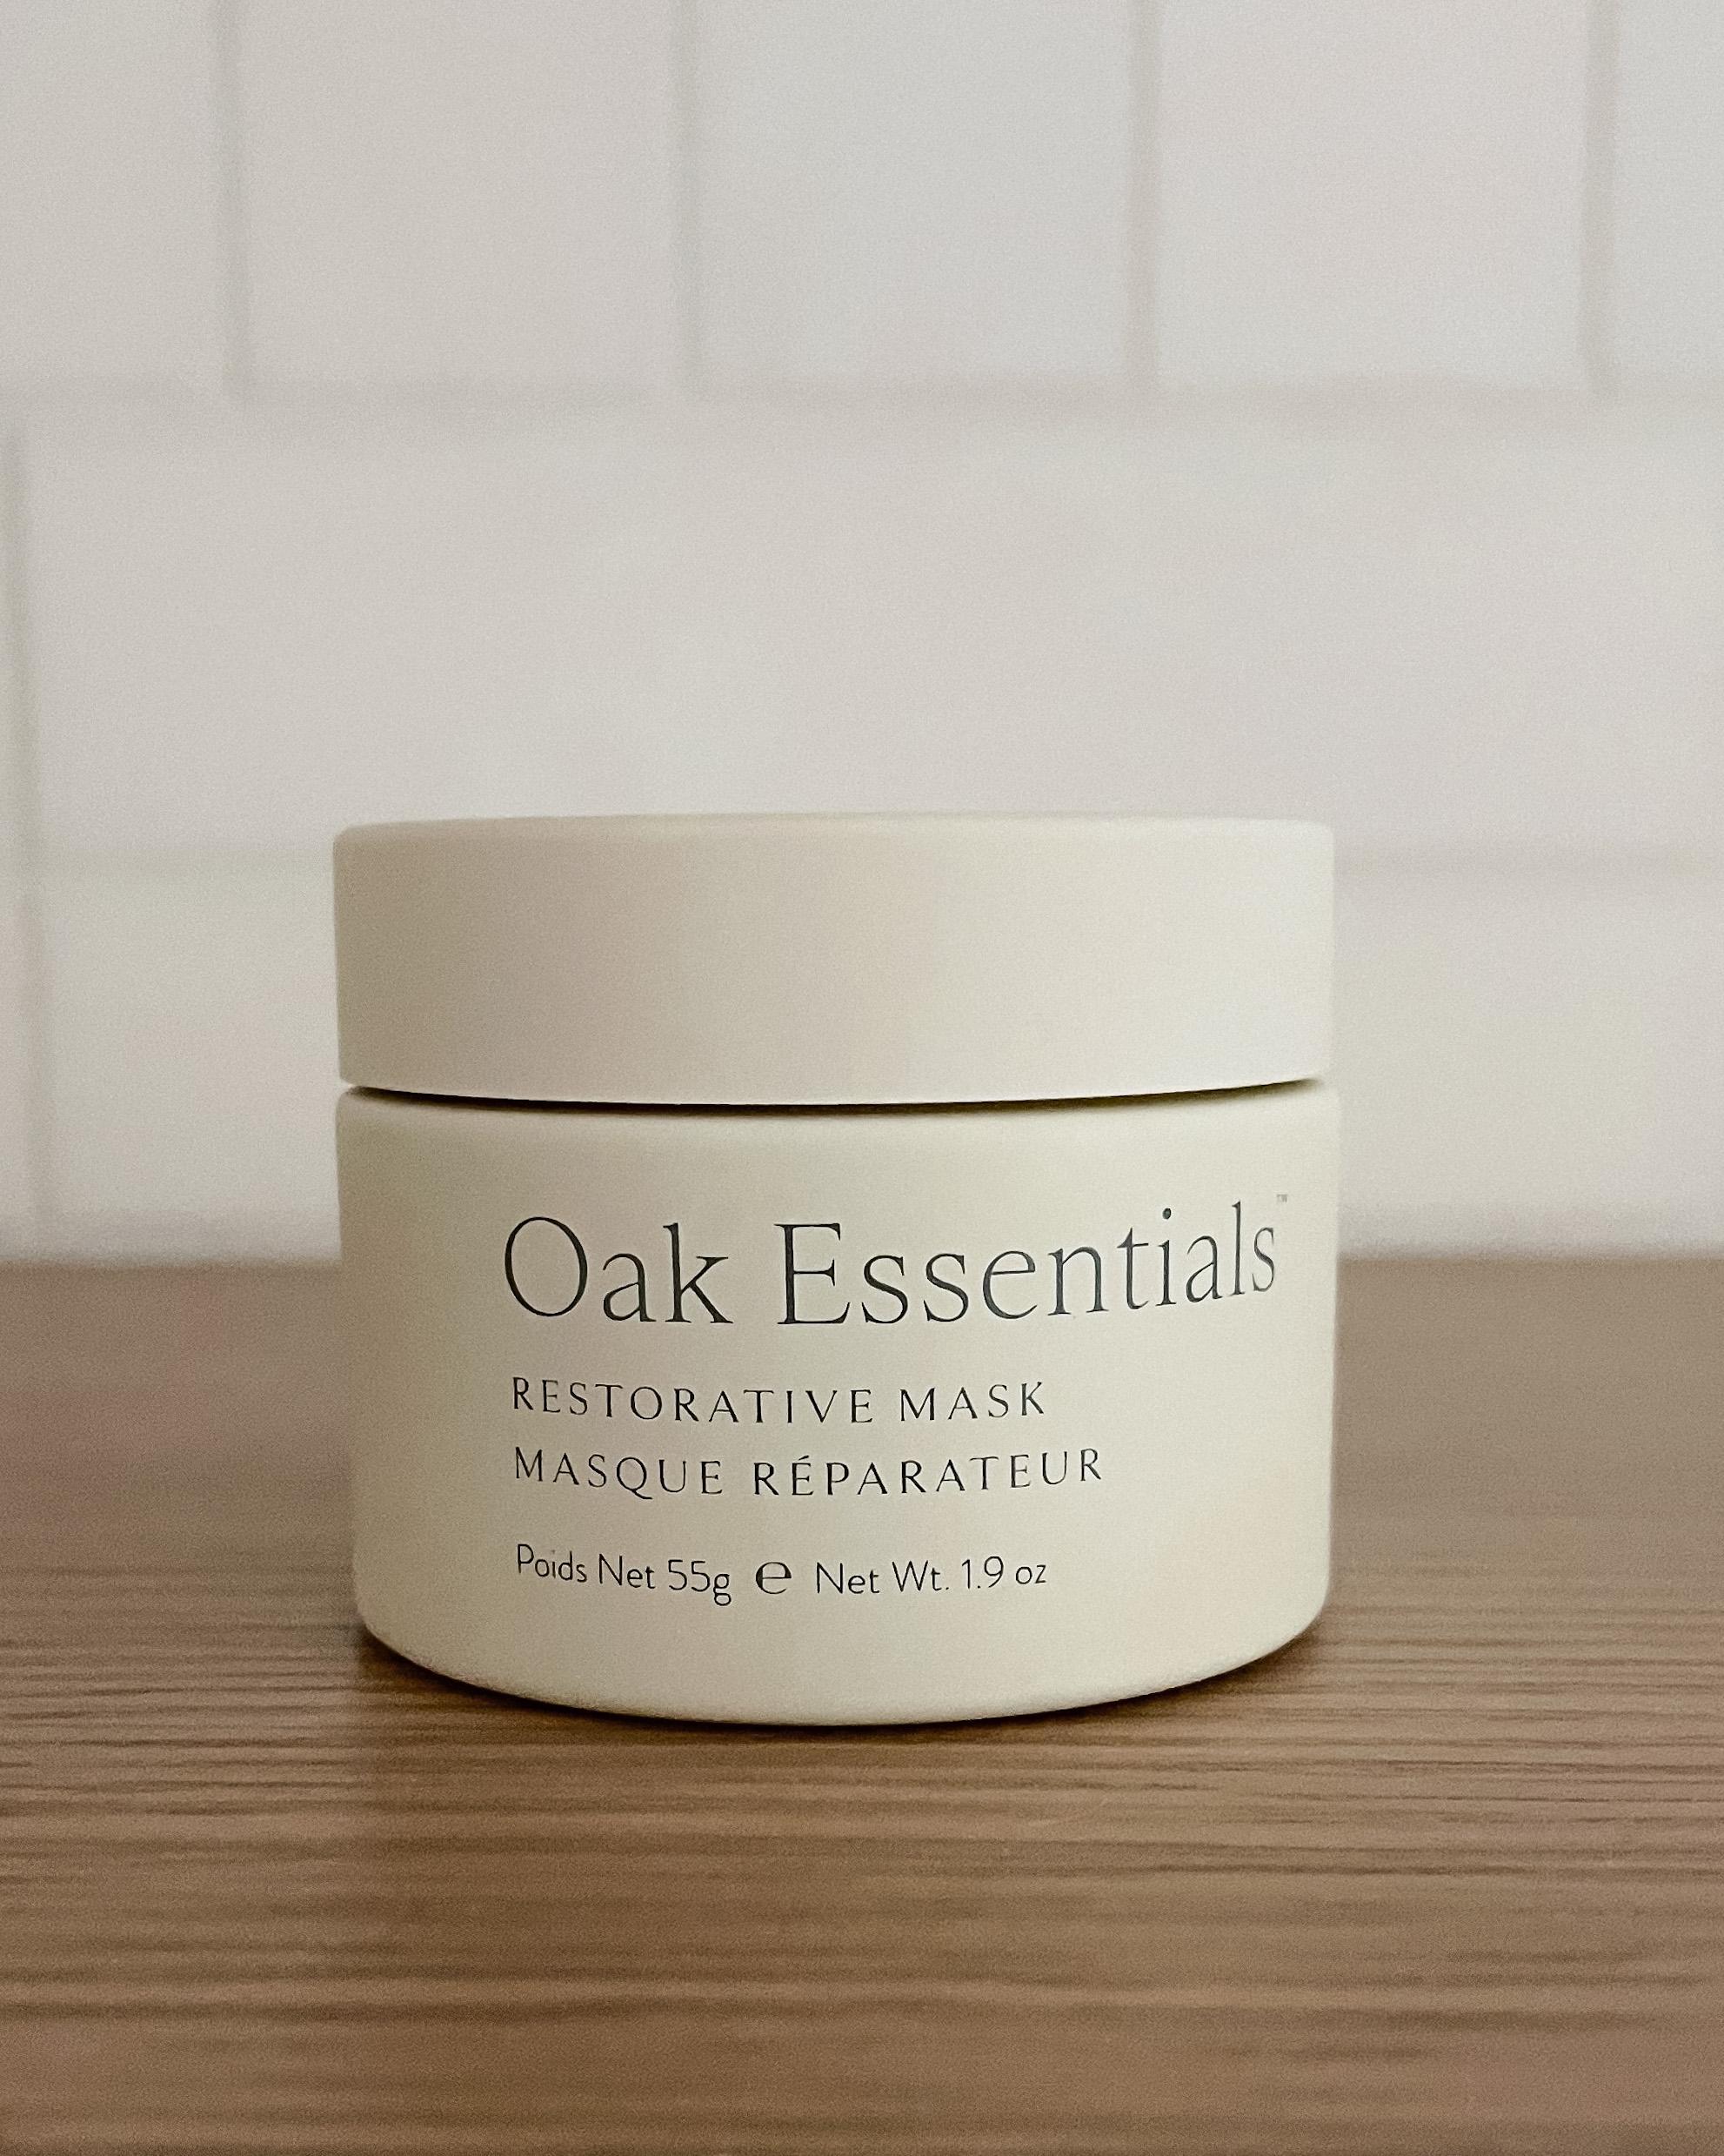 Jenni Kayne Oak Essentials Restorative Mask